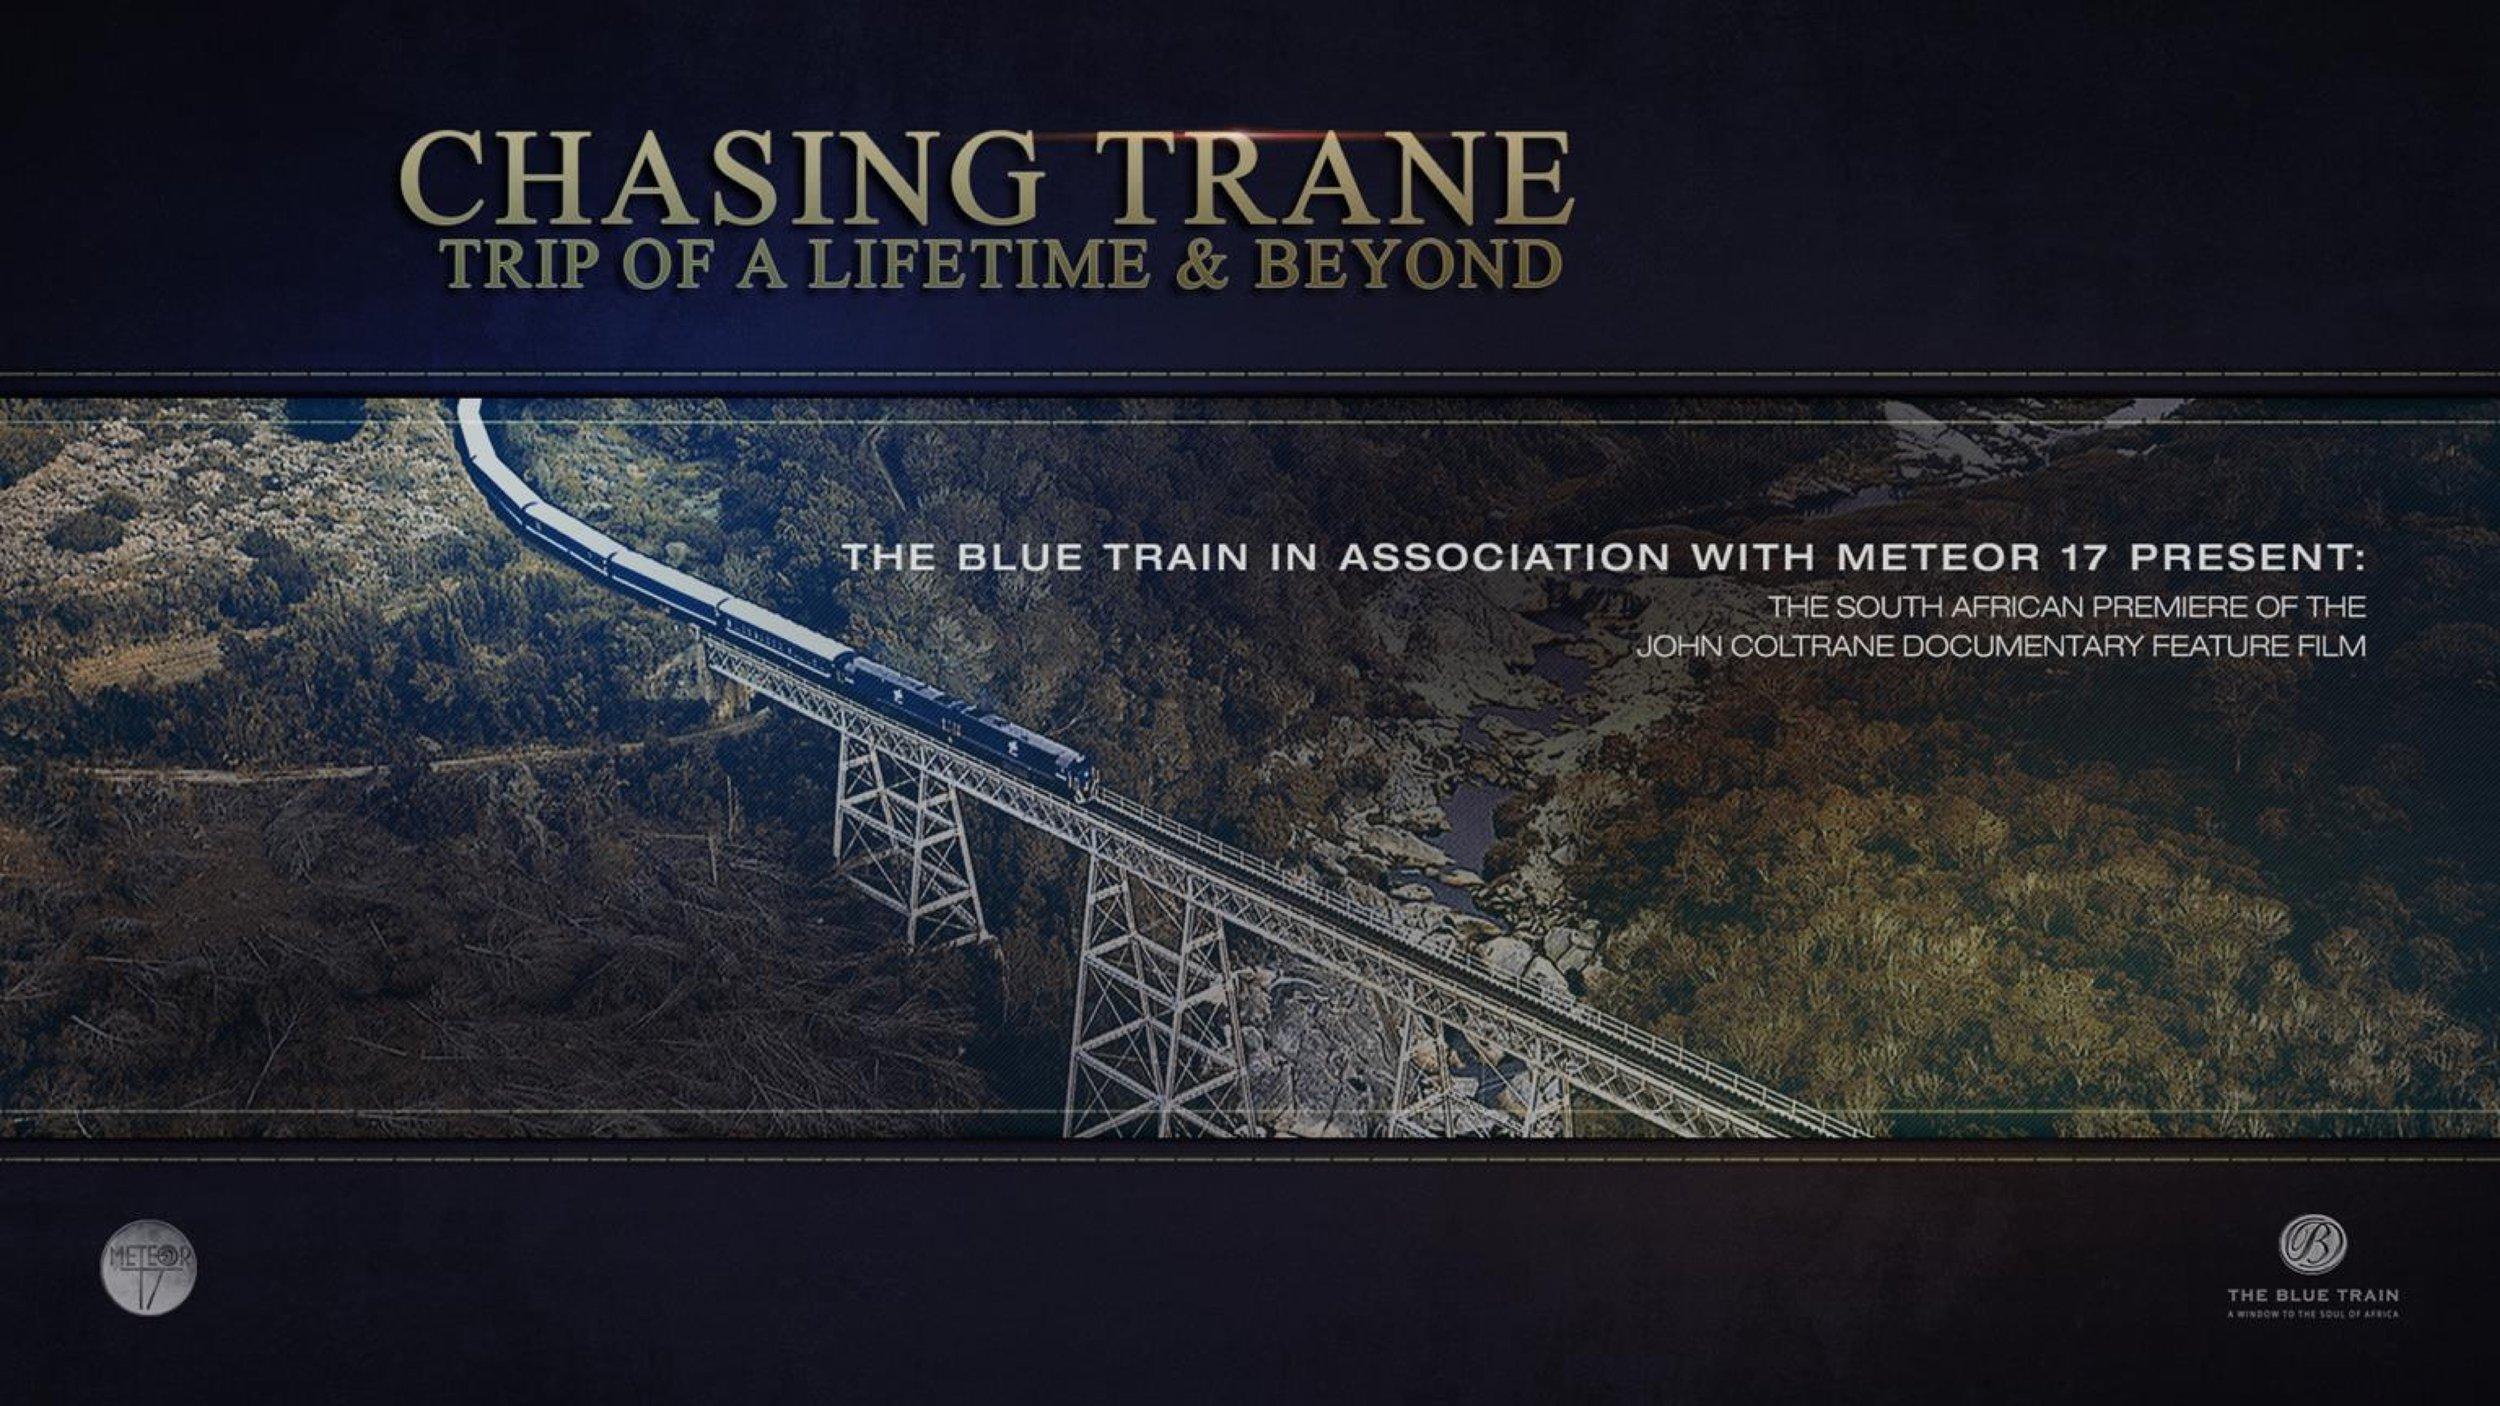 Midnight Blue Train *Transnet M17 updated deck 3 8.jpeg